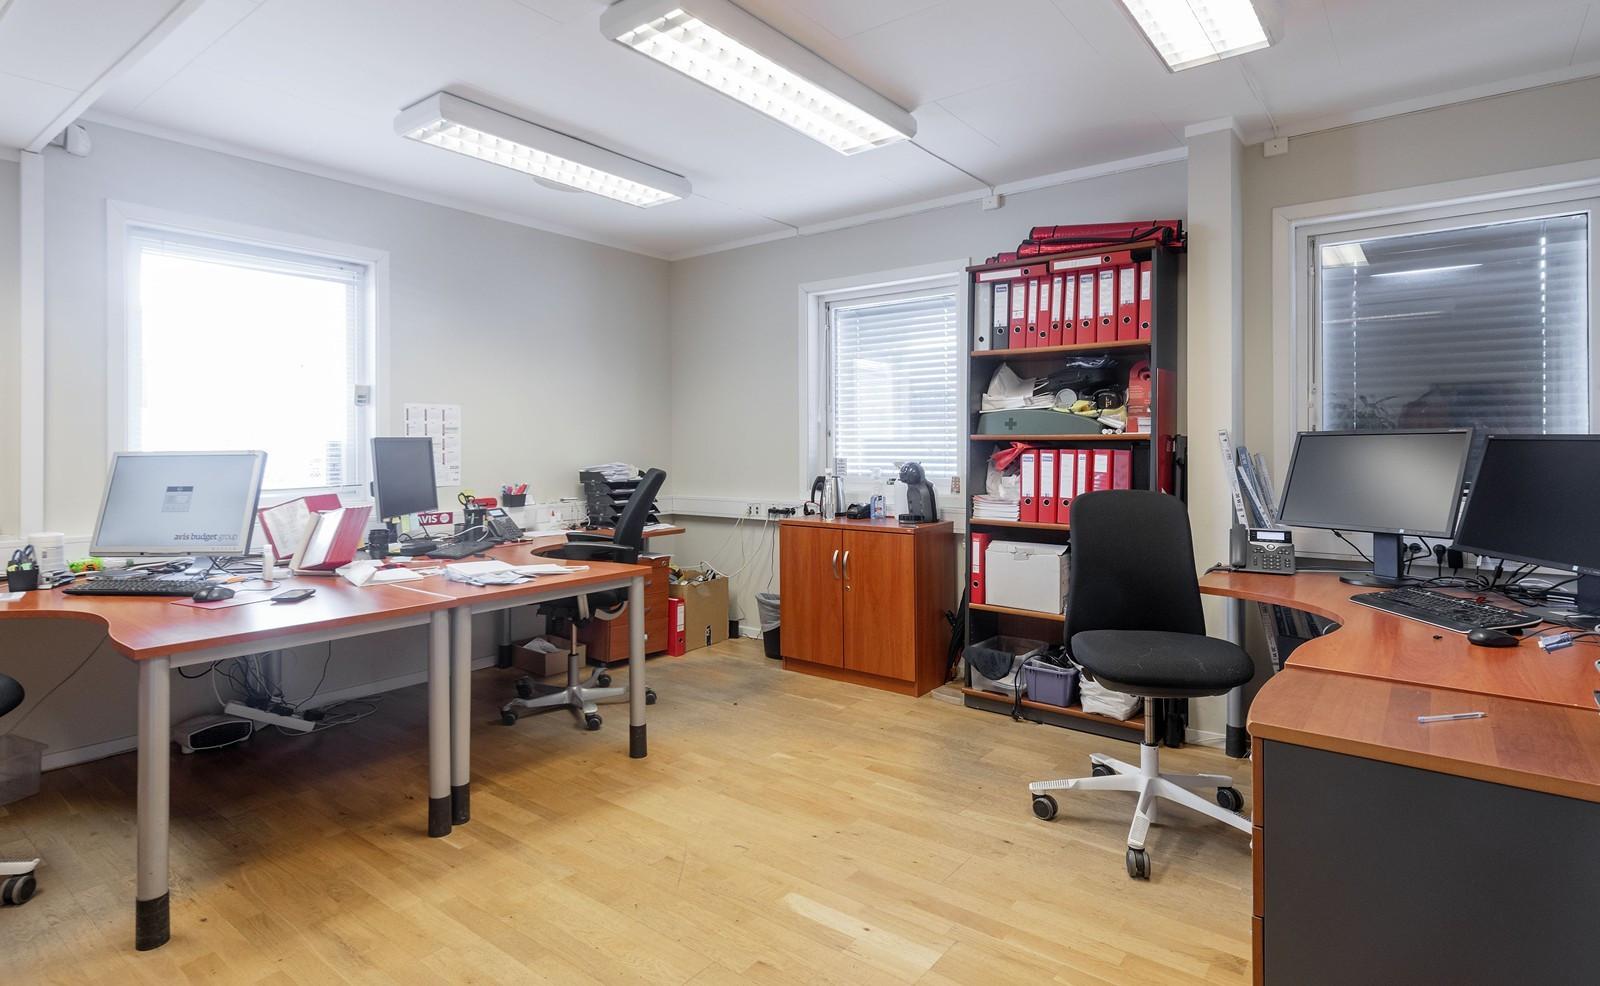 Stort kontor med plass til flere kontorplasser